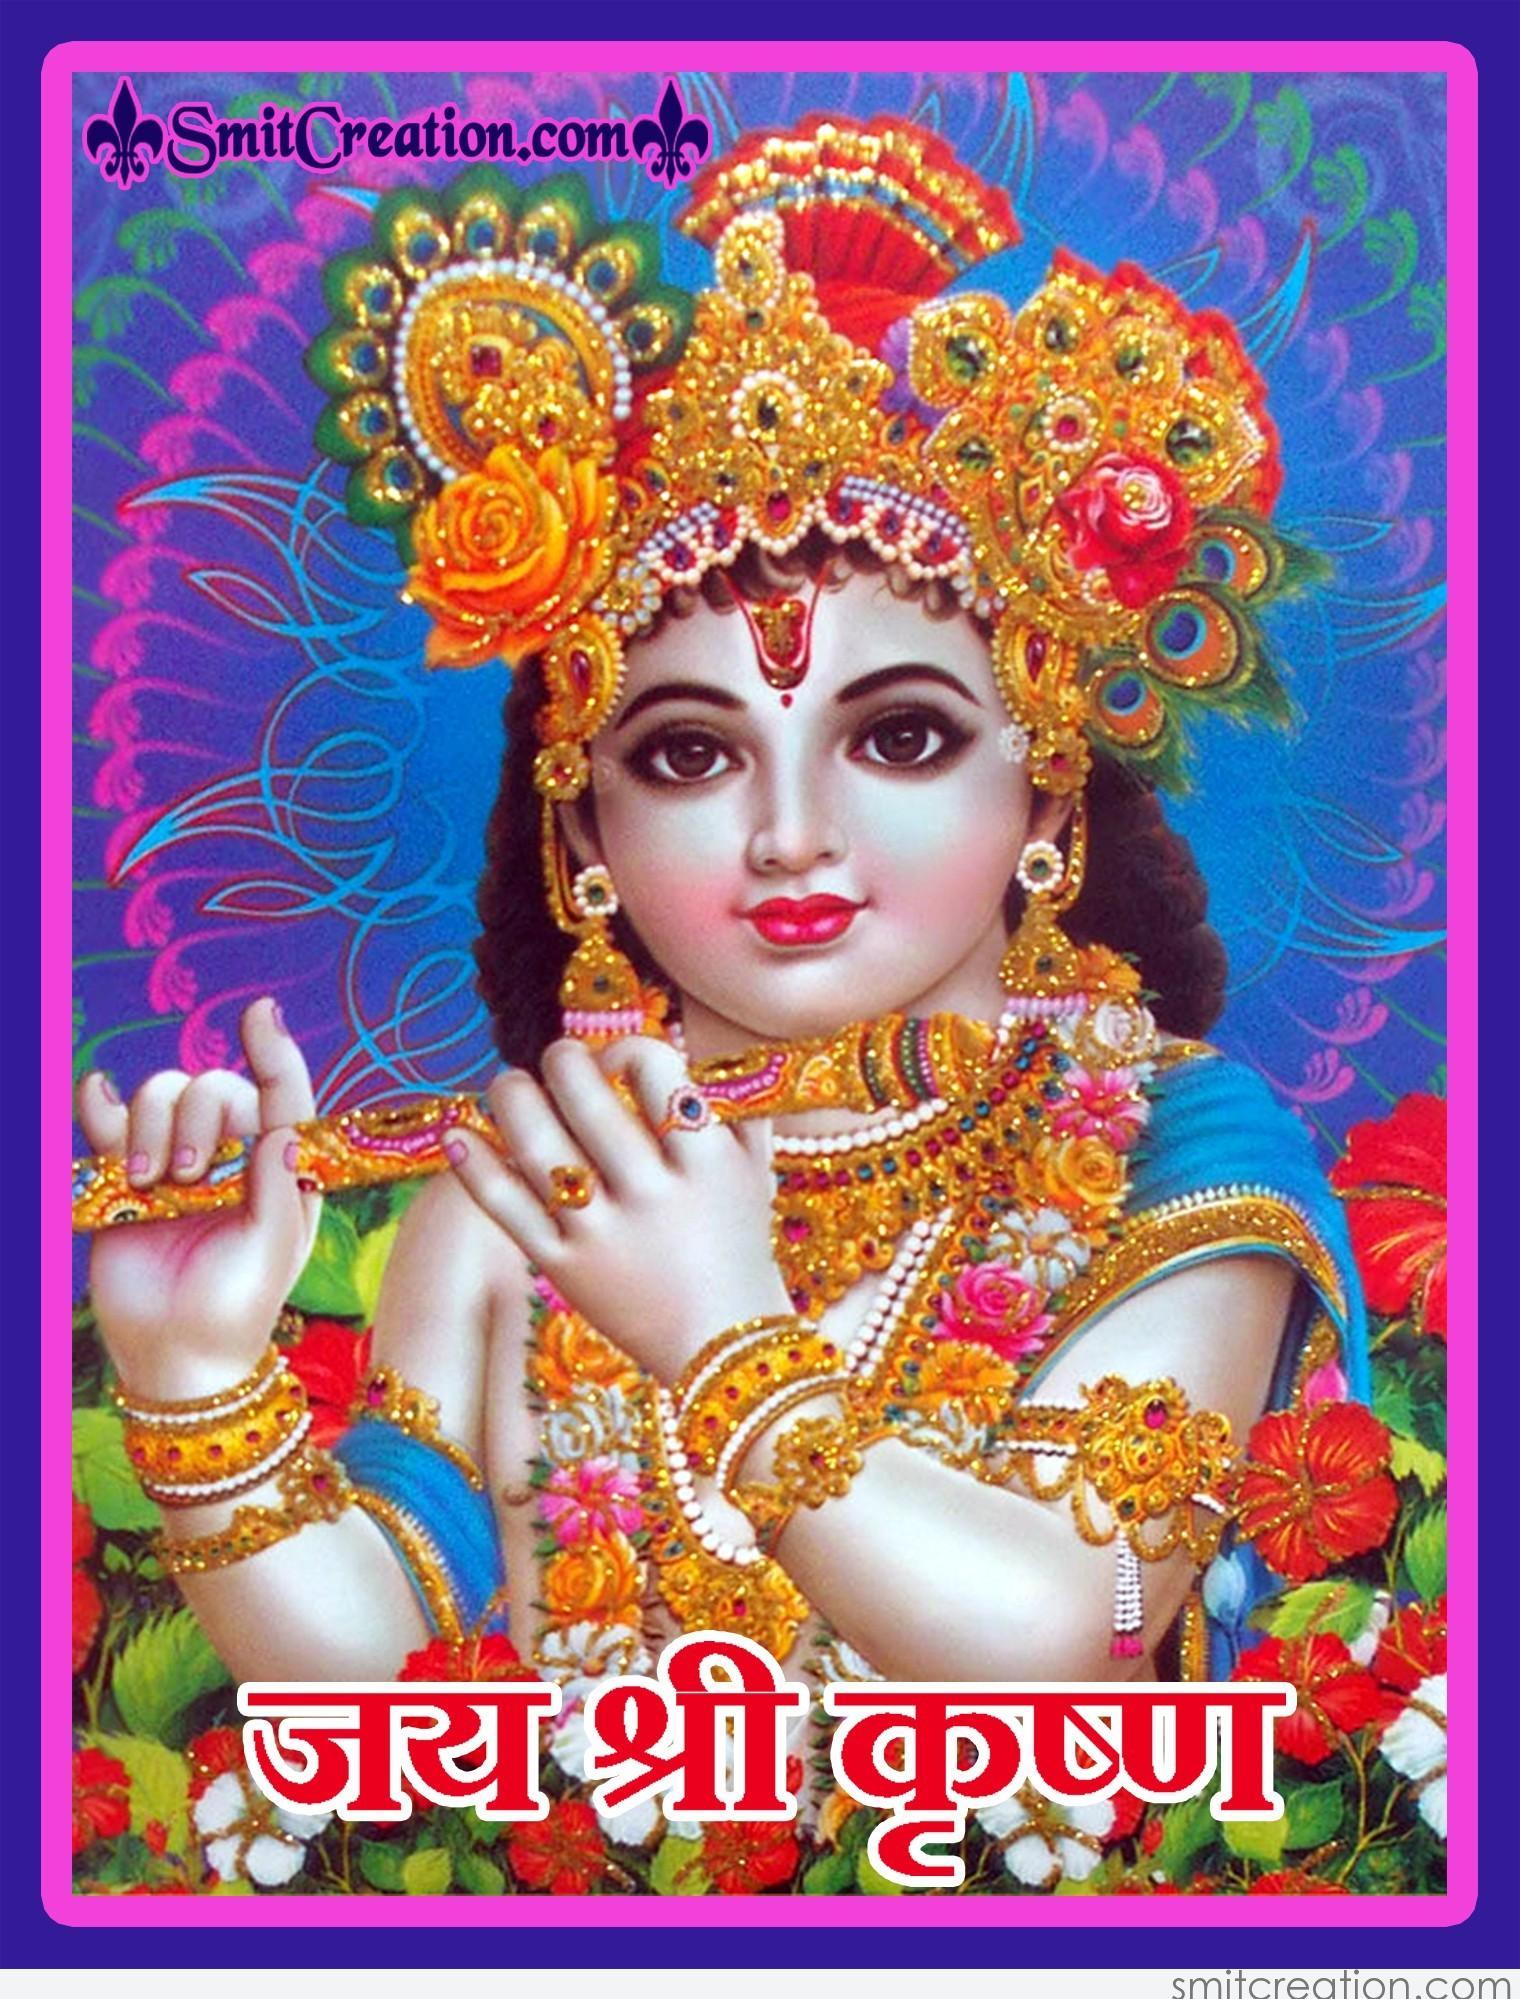 nagdaman by krishna written in gujrati Nagdaman by krishna written in gujrati the death of his dear friend influenced him  to write an elegy, which is a poem expressing sorrow or lamentation.